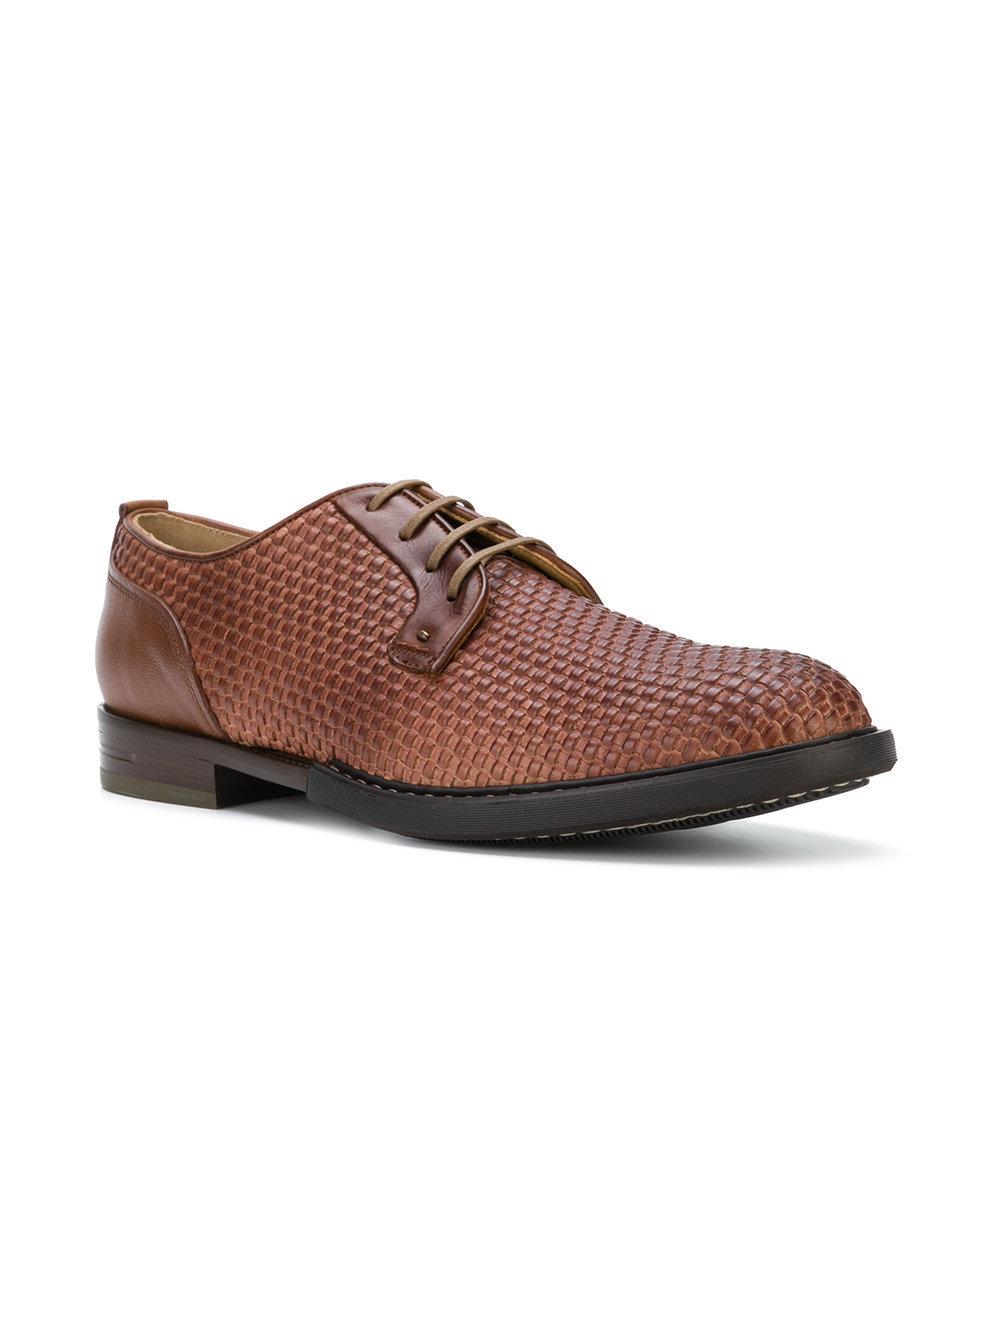 timeless design 2450b 38cbd £102, BRIMARTS Woven Oxford Shoes